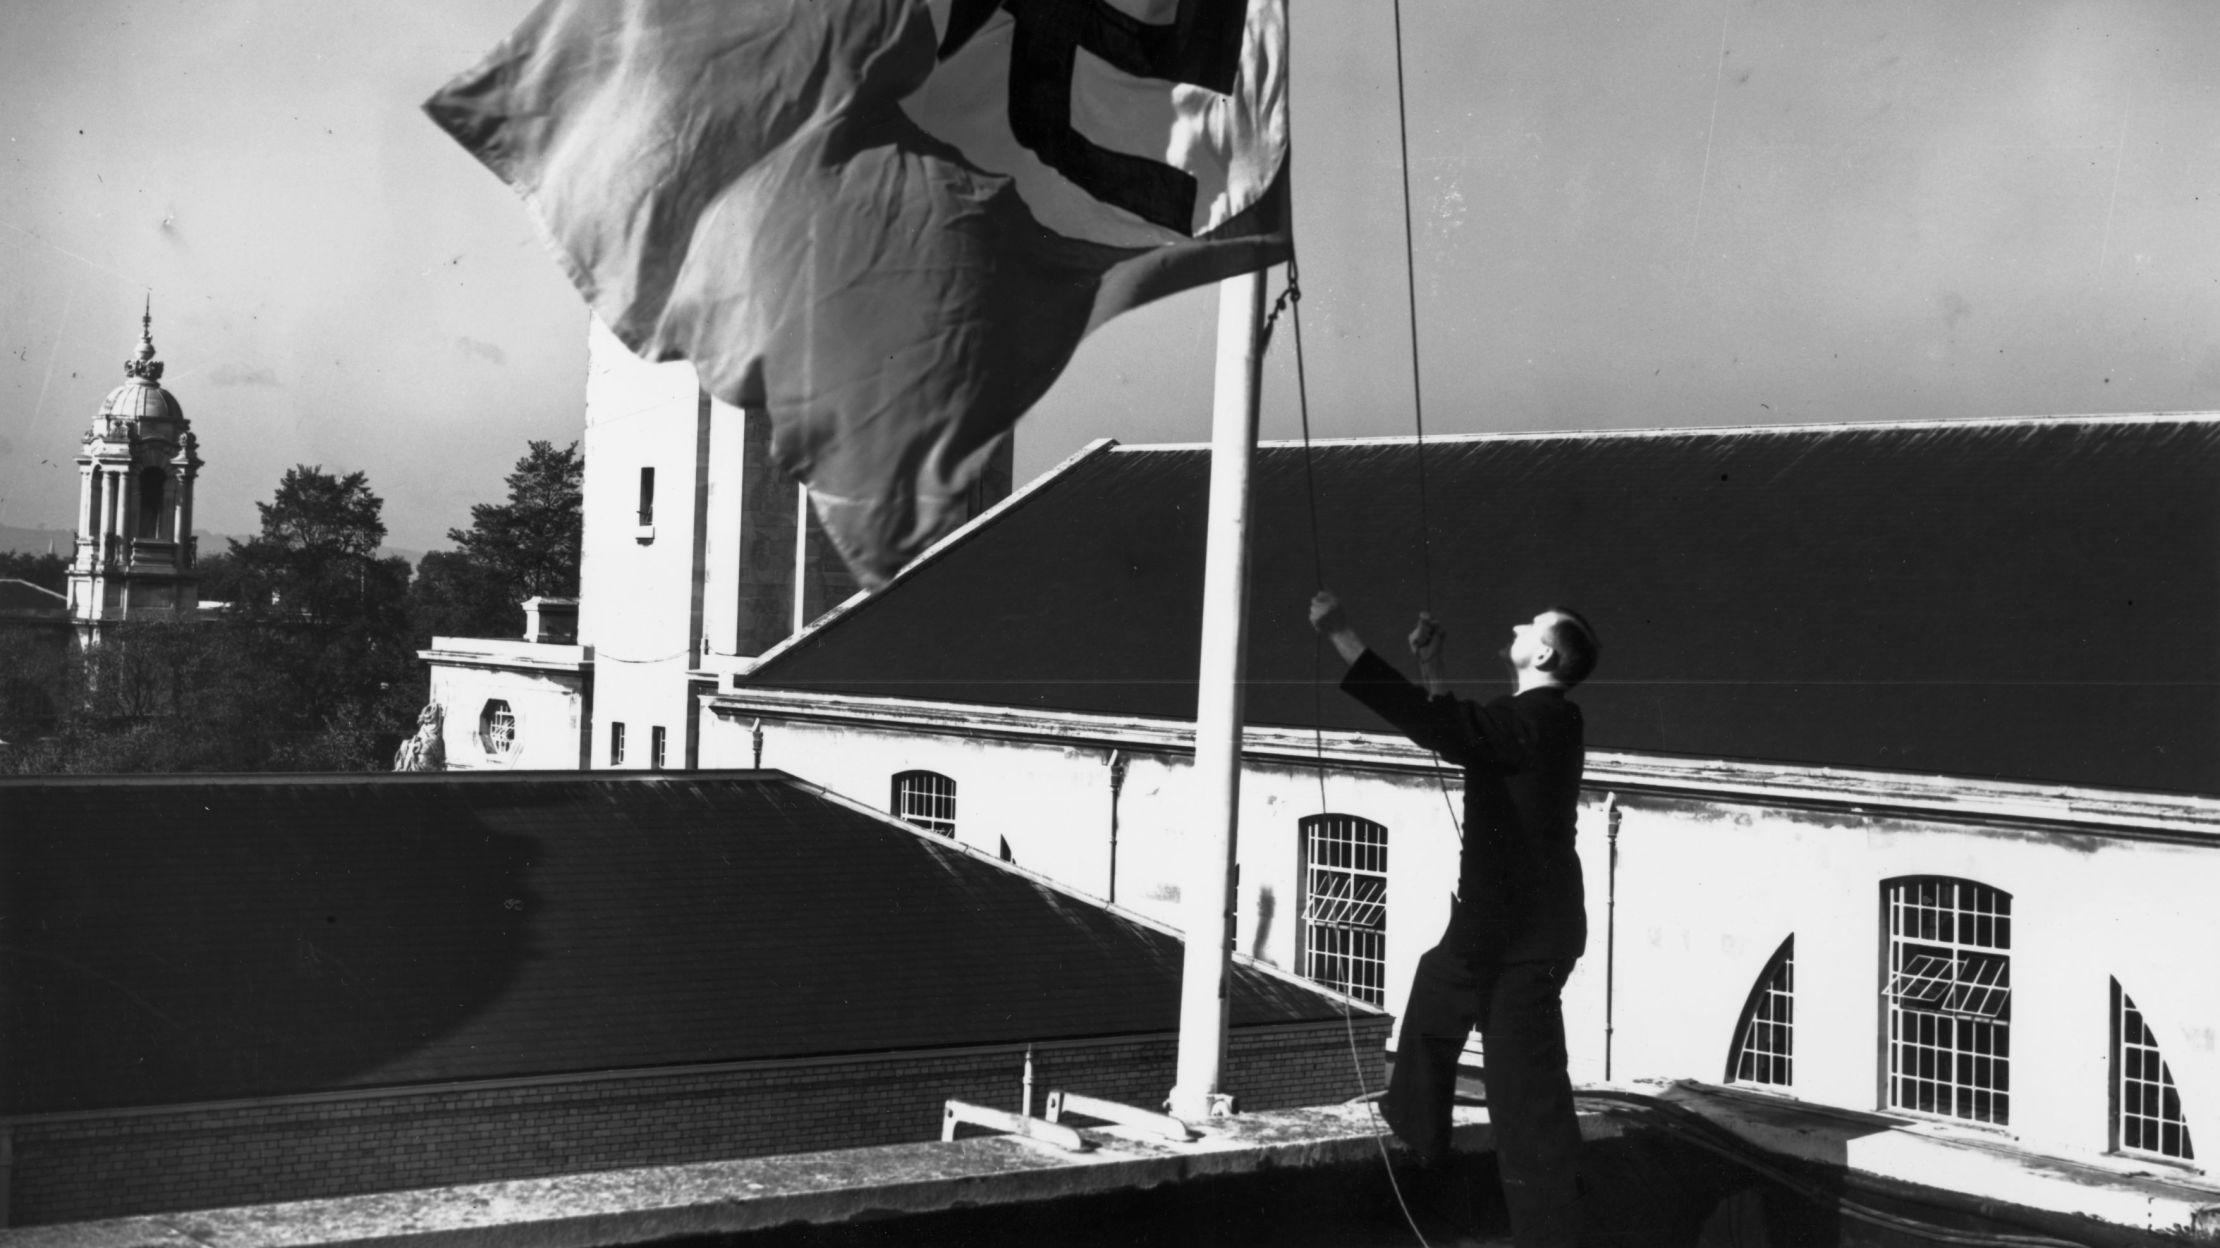 Why Did the Nazis Hijack the Swastika? | Mental Floss